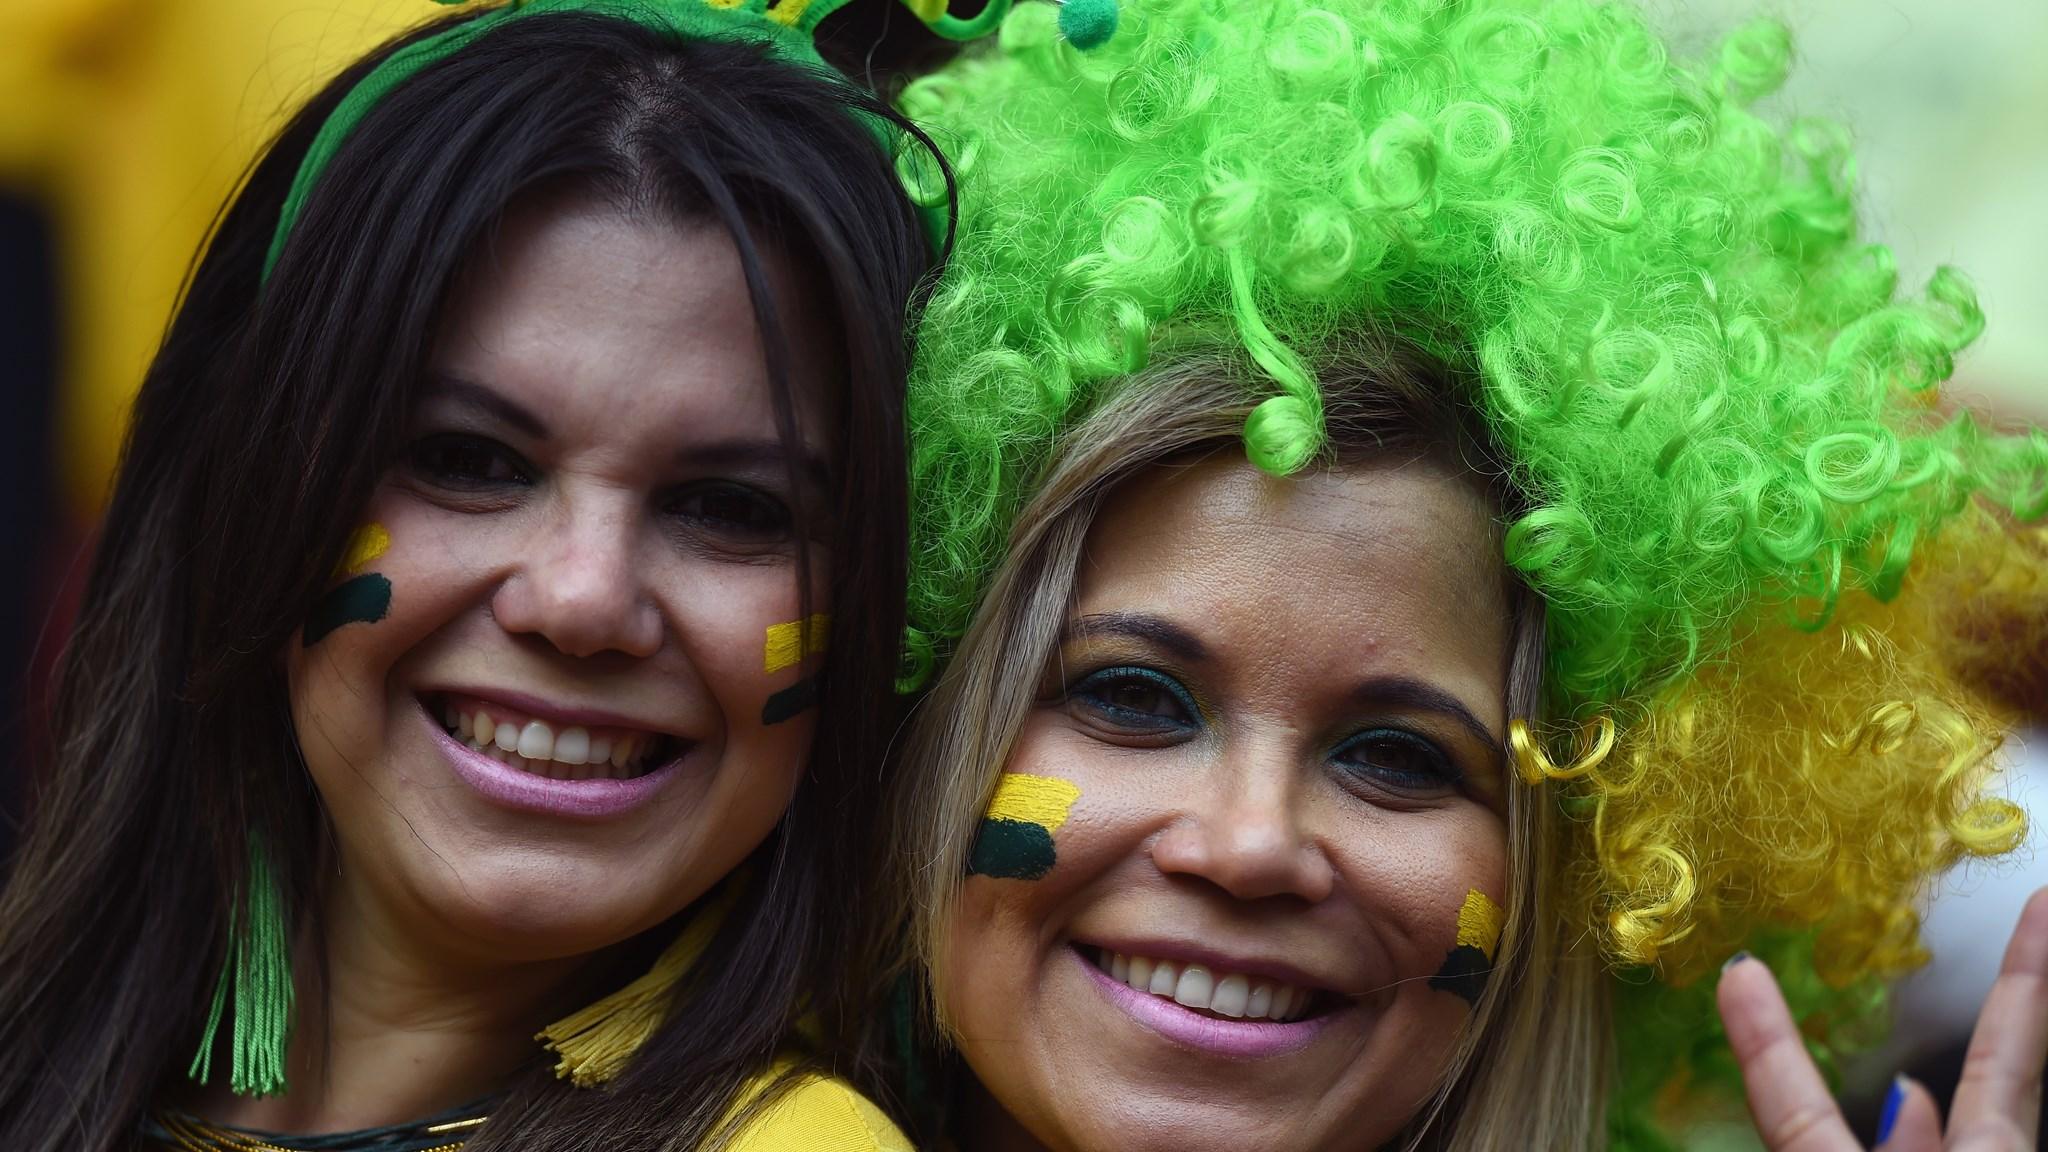 171 - Brazil-Netherlands [0-3] -- 12 Jul 2014 - 17-00 - kuaza